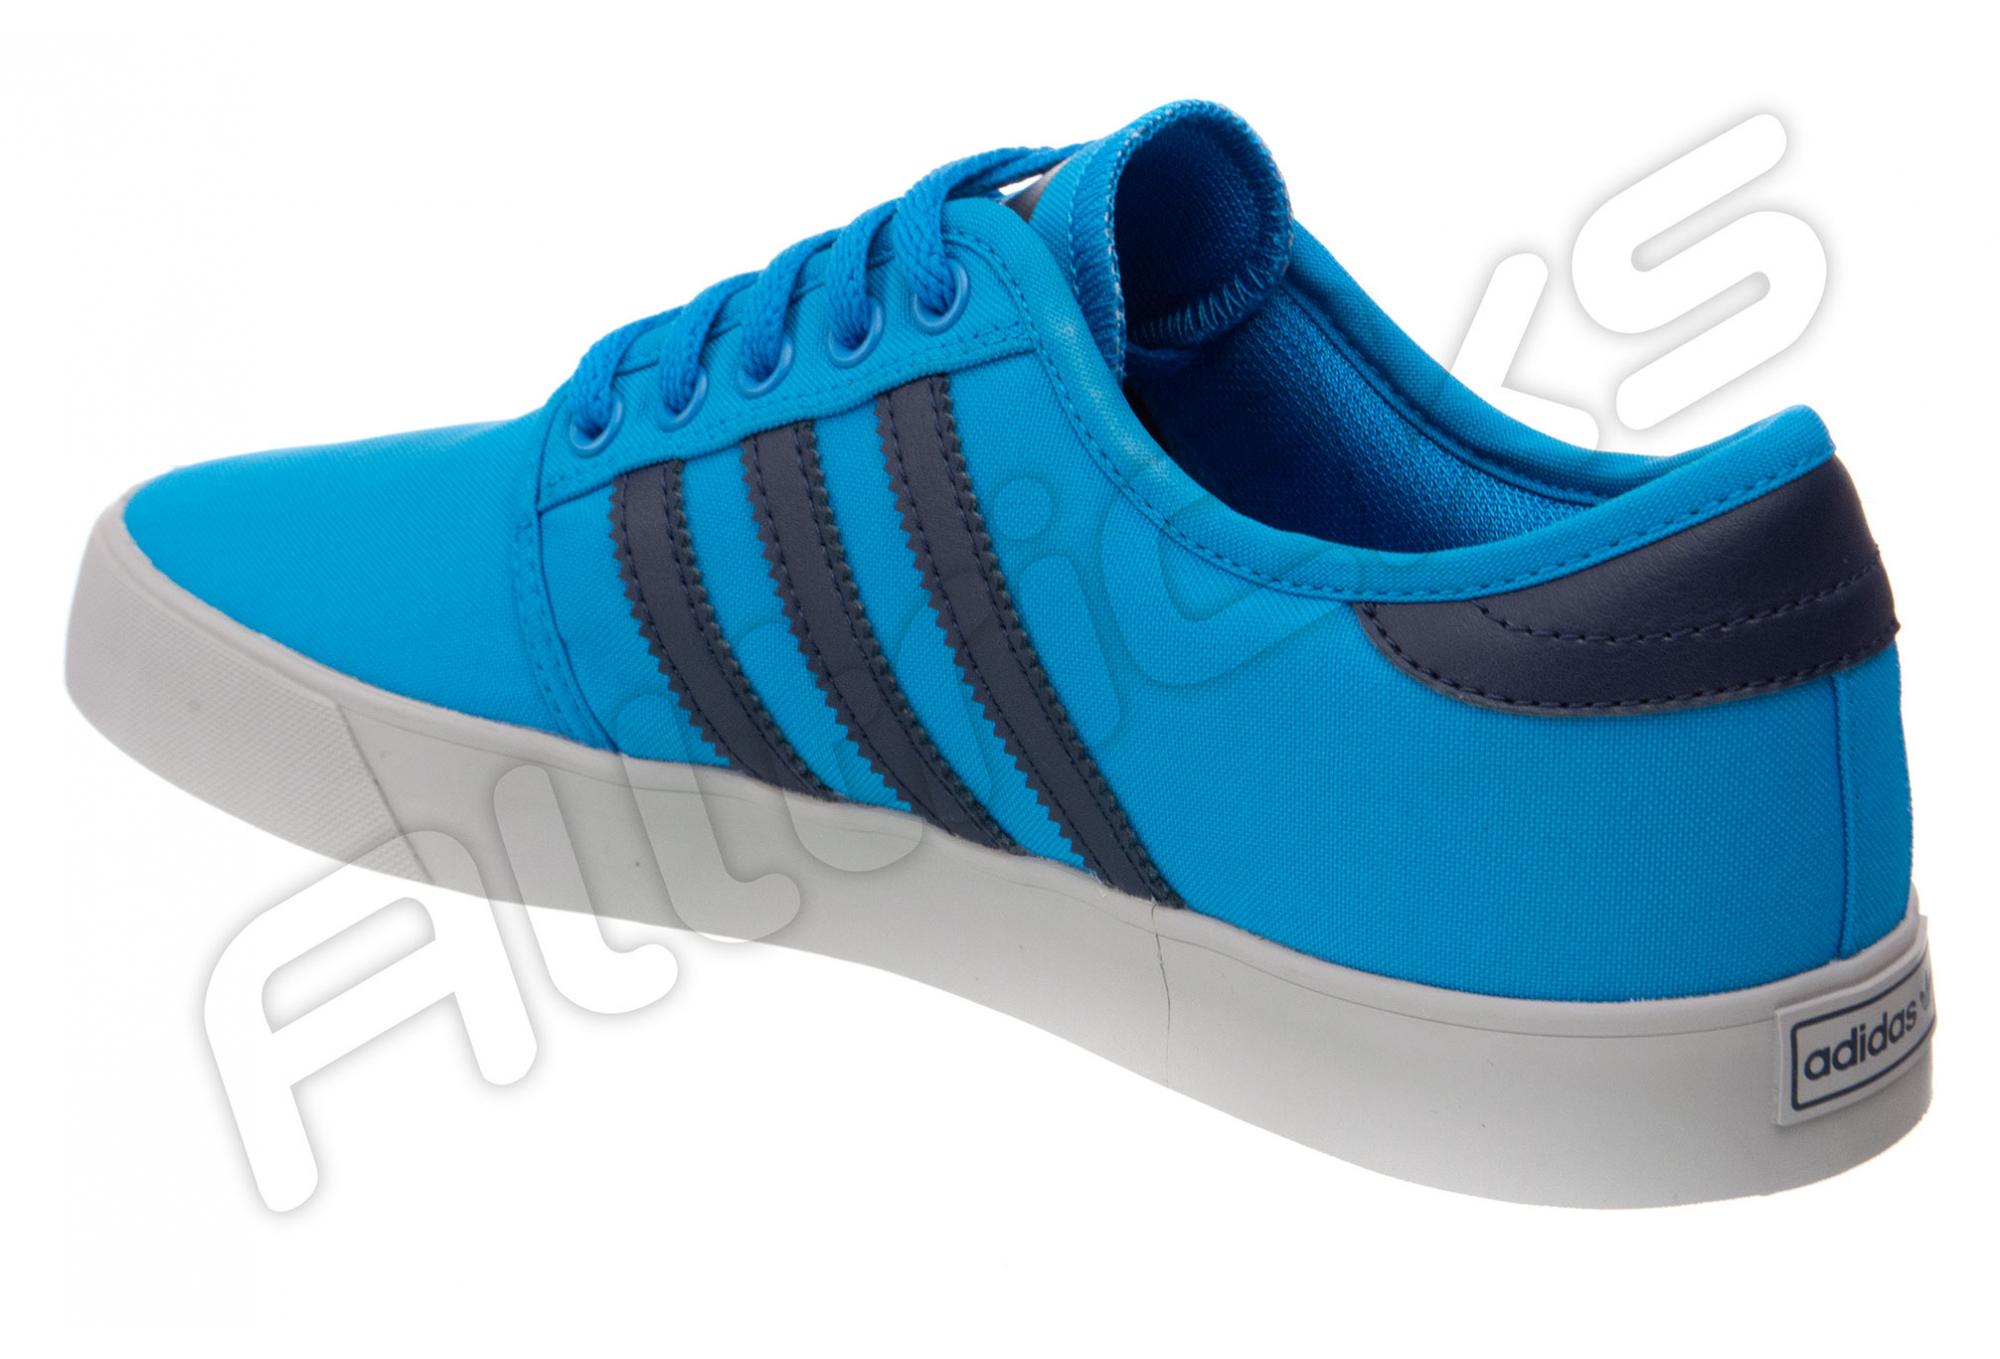 Troy Lee Designs Seeley LTD Adidas Team Shoes Blue